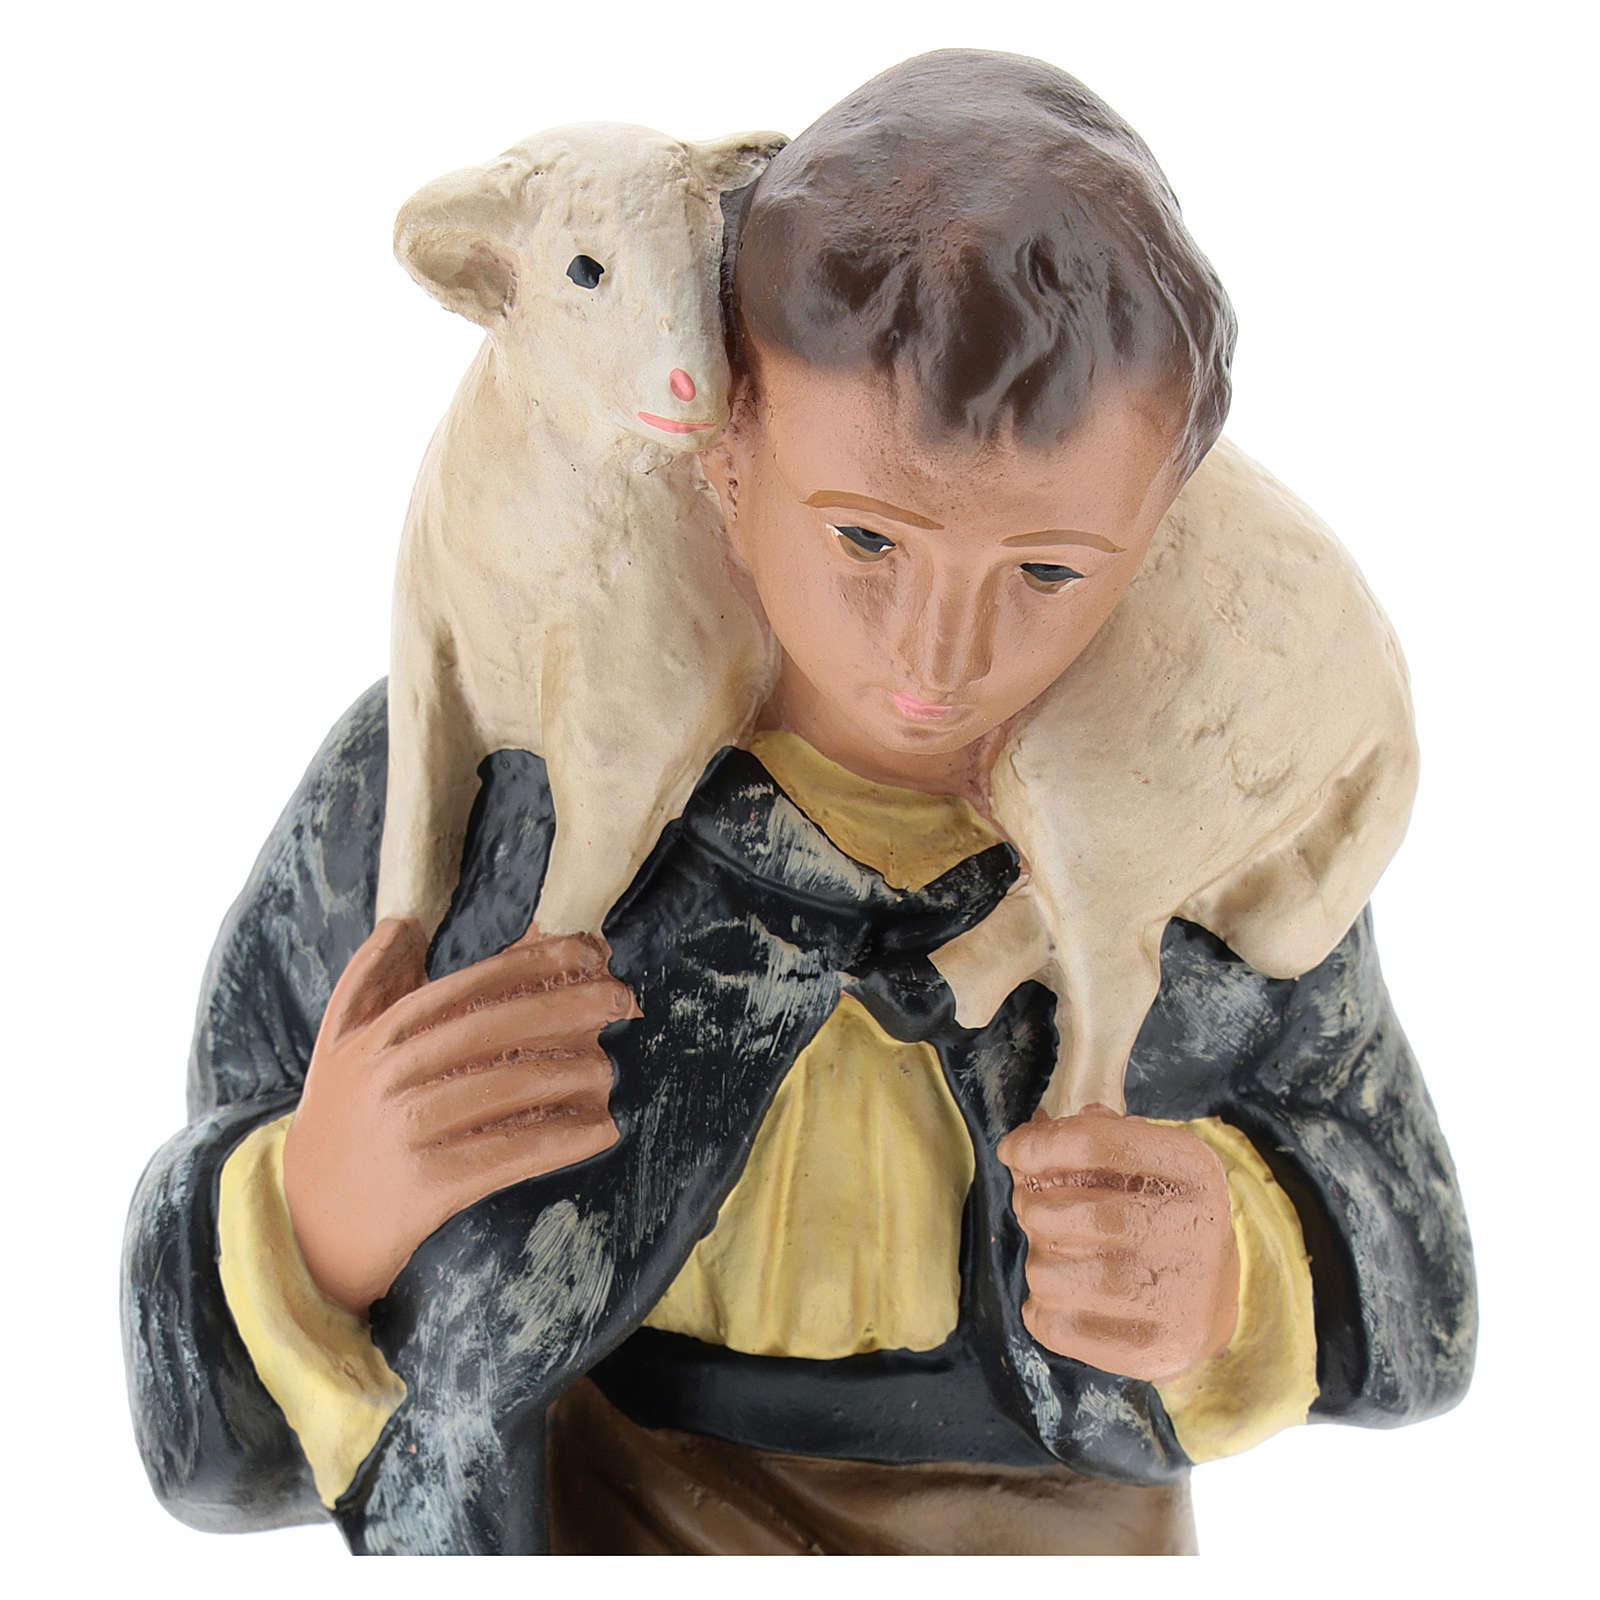 Statua pastore inginocchiato con pecora presepe 20 cm Arte Barsanti 4